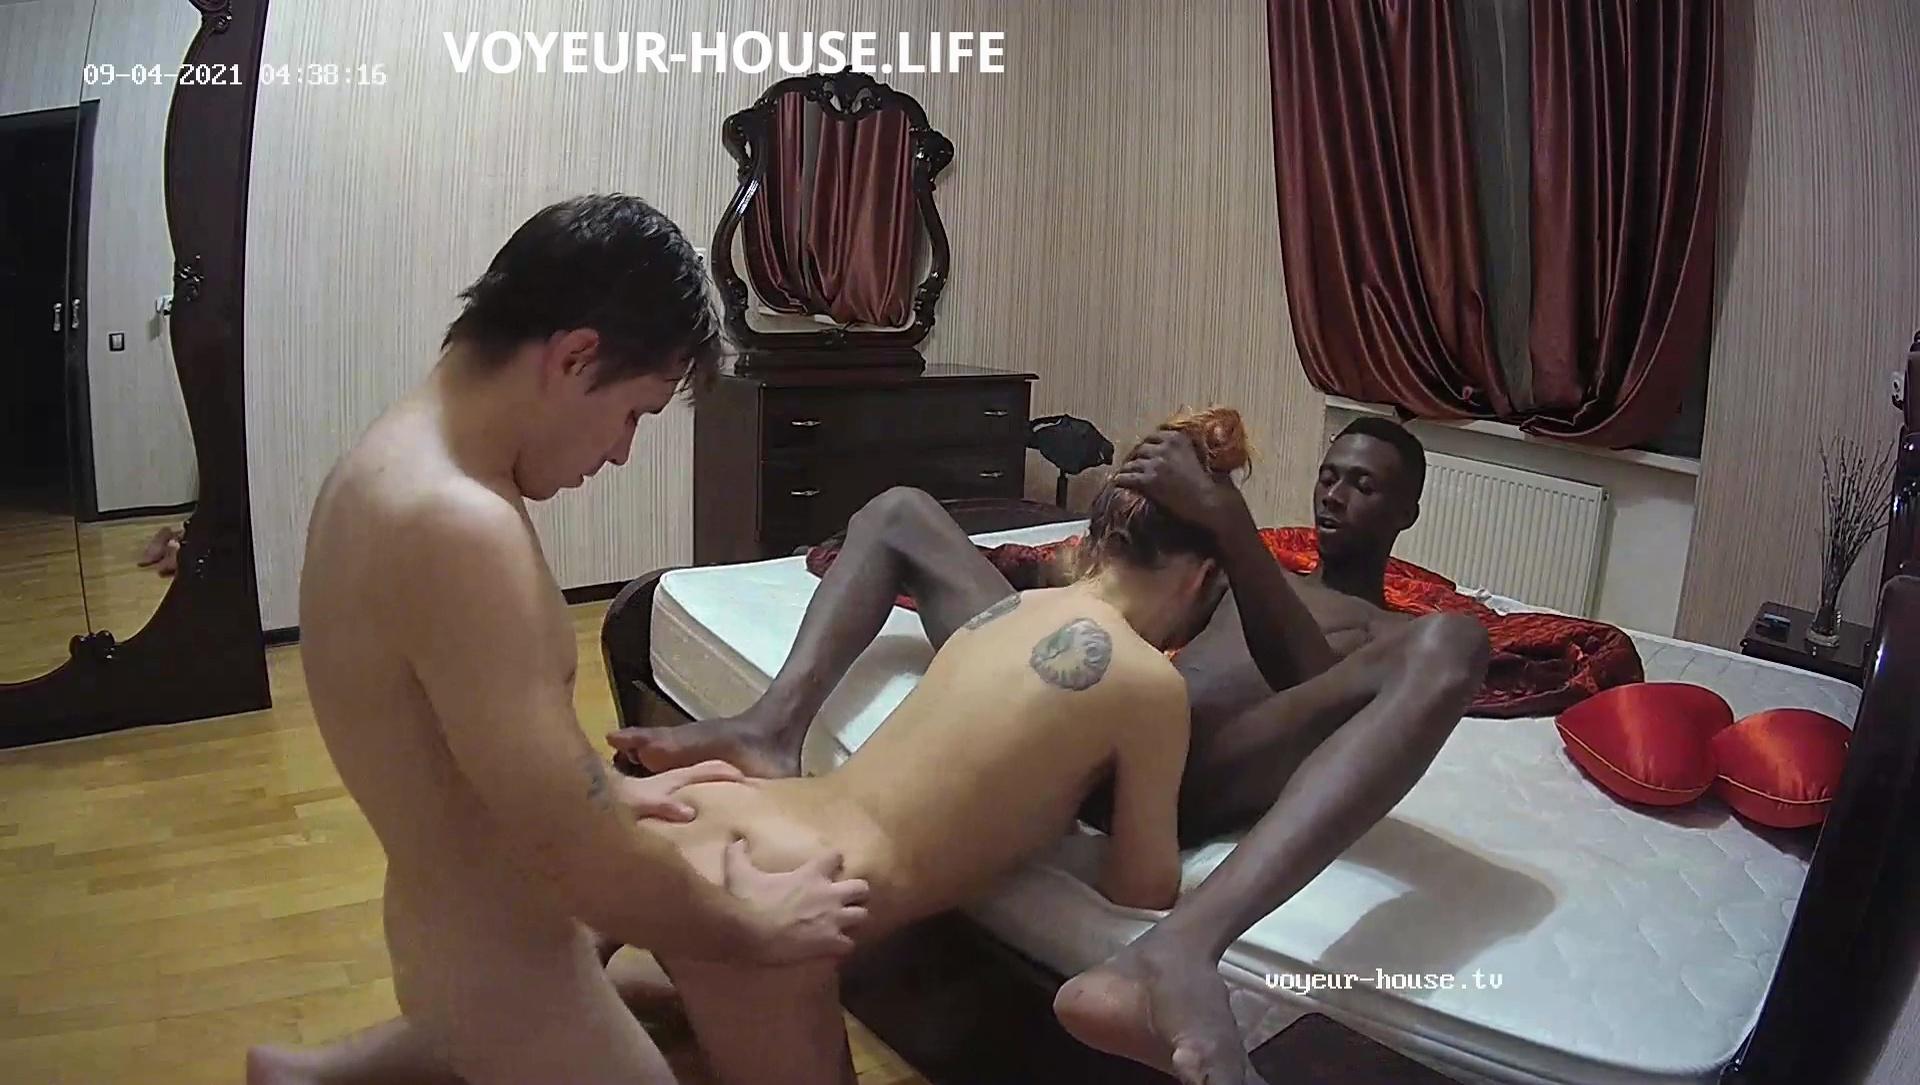 Luchik Angelo Altera Bisexual 3some Part 2 Sep 04 2021 cam 2